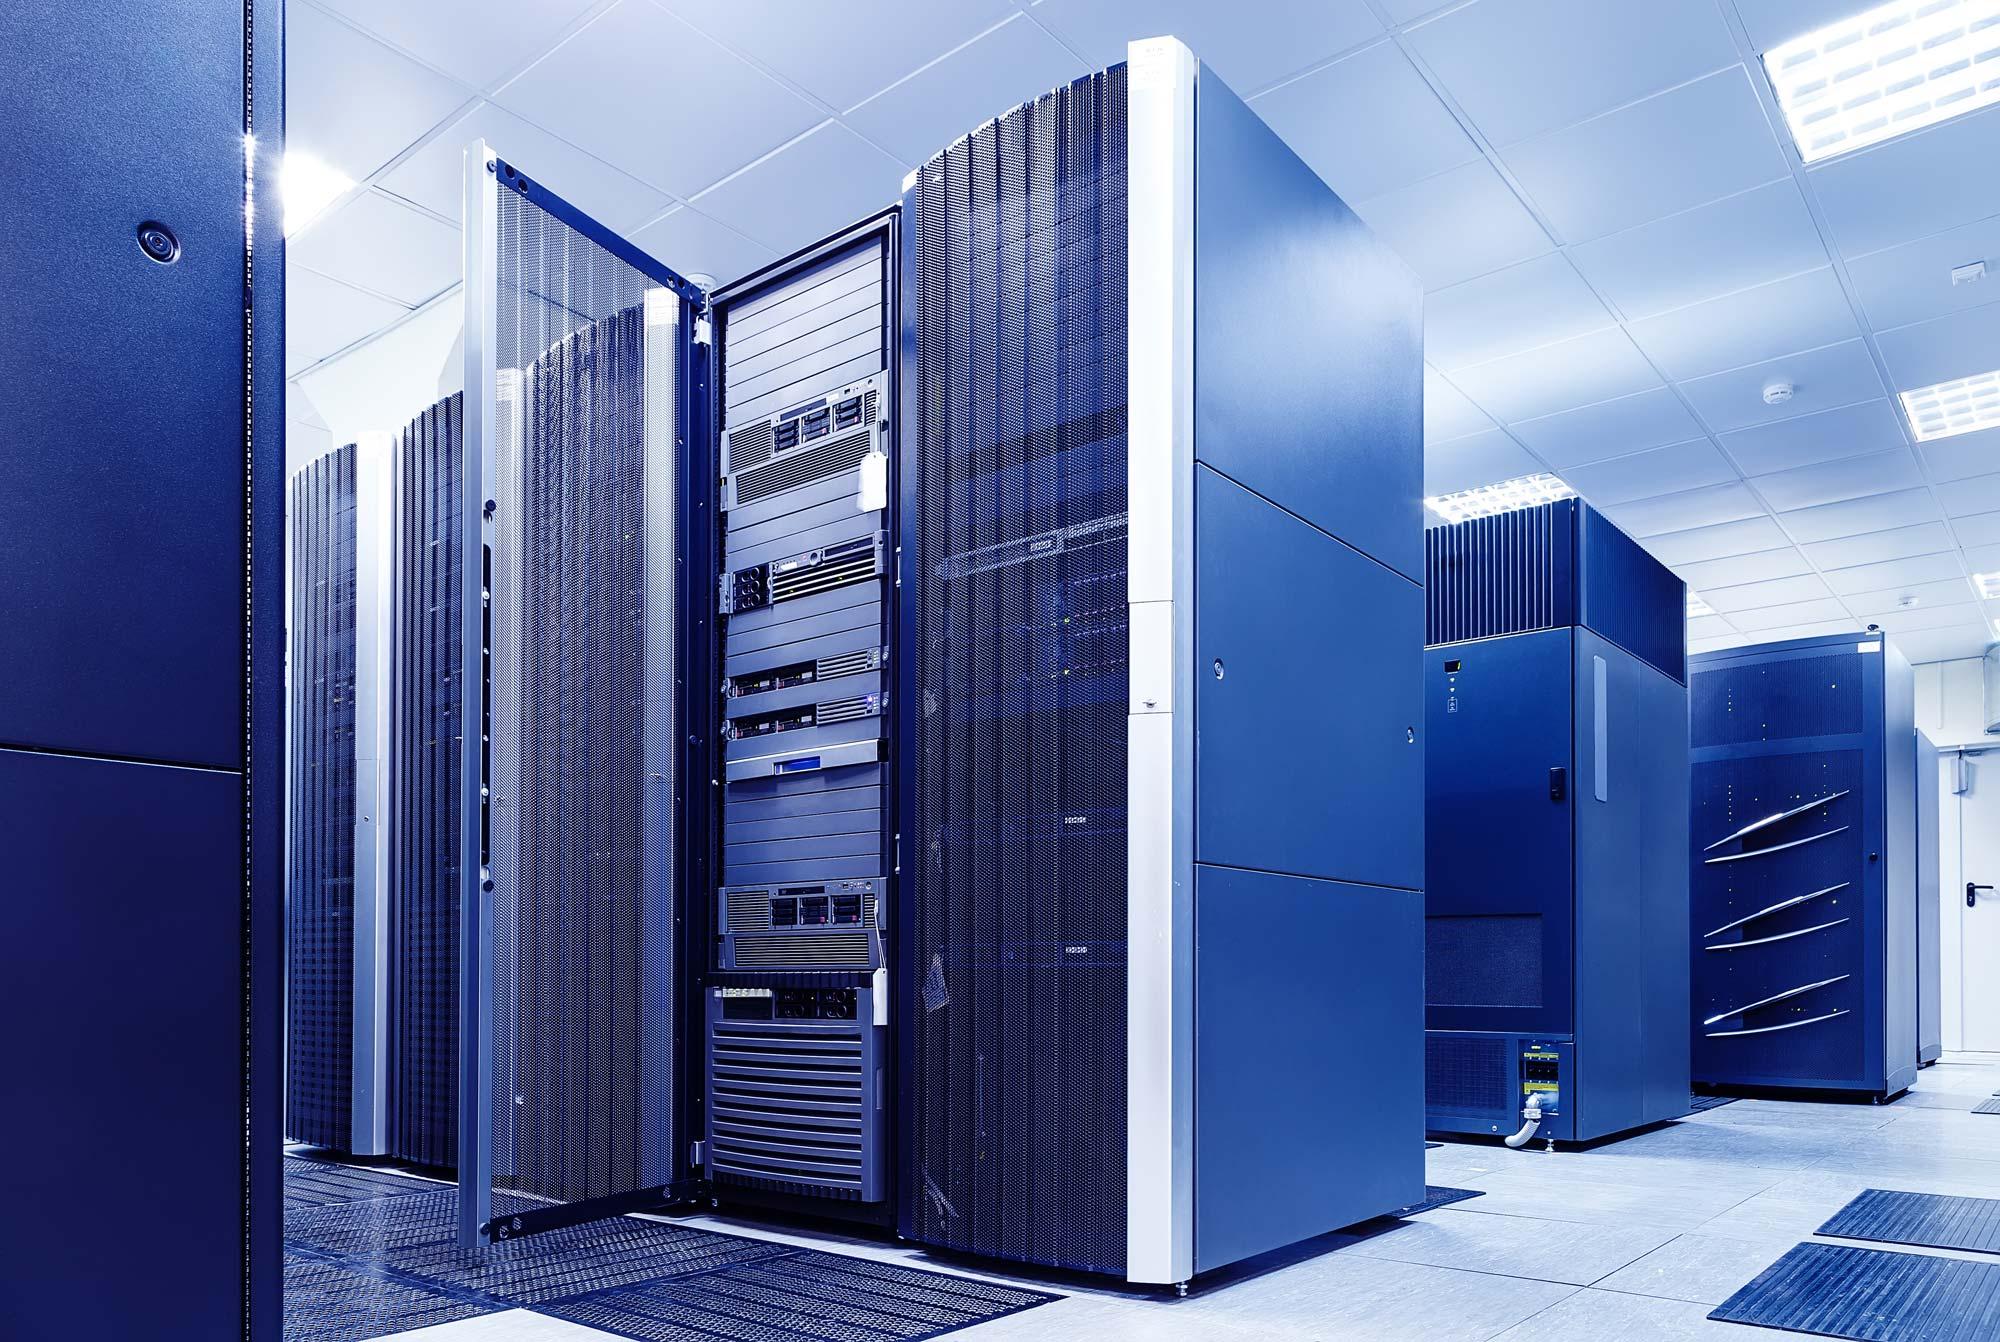 Mannai ICT - Information and Communication Technology